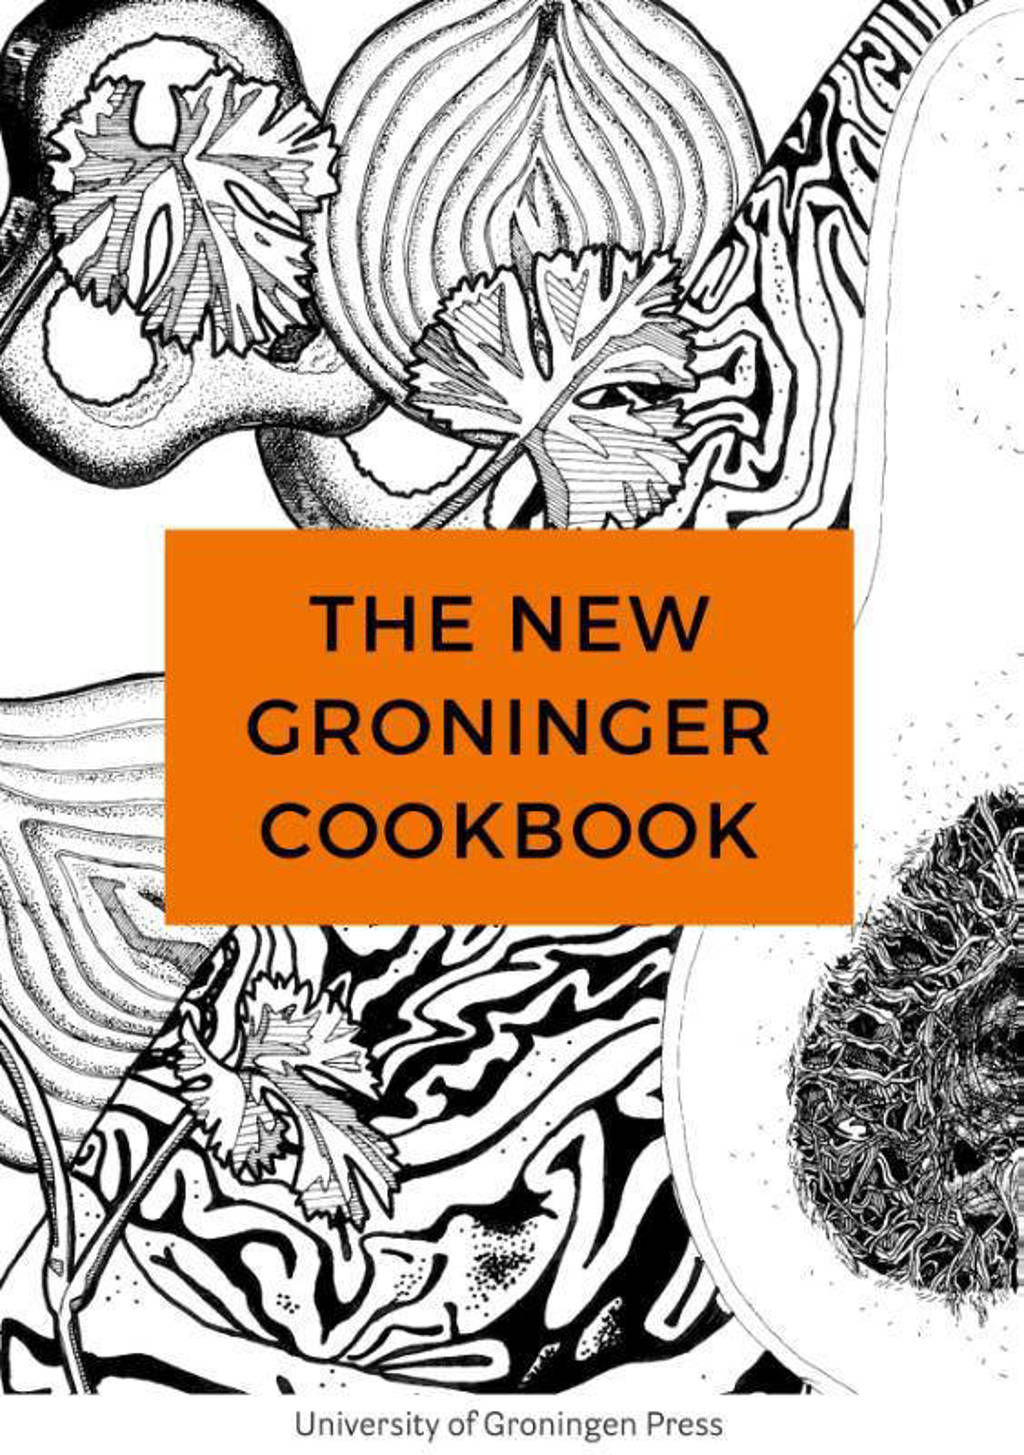 The New Groninger Cookbook - Zechariah Allmlaji, Willemijn Amersfoort, Fenne Bagust, e.a.